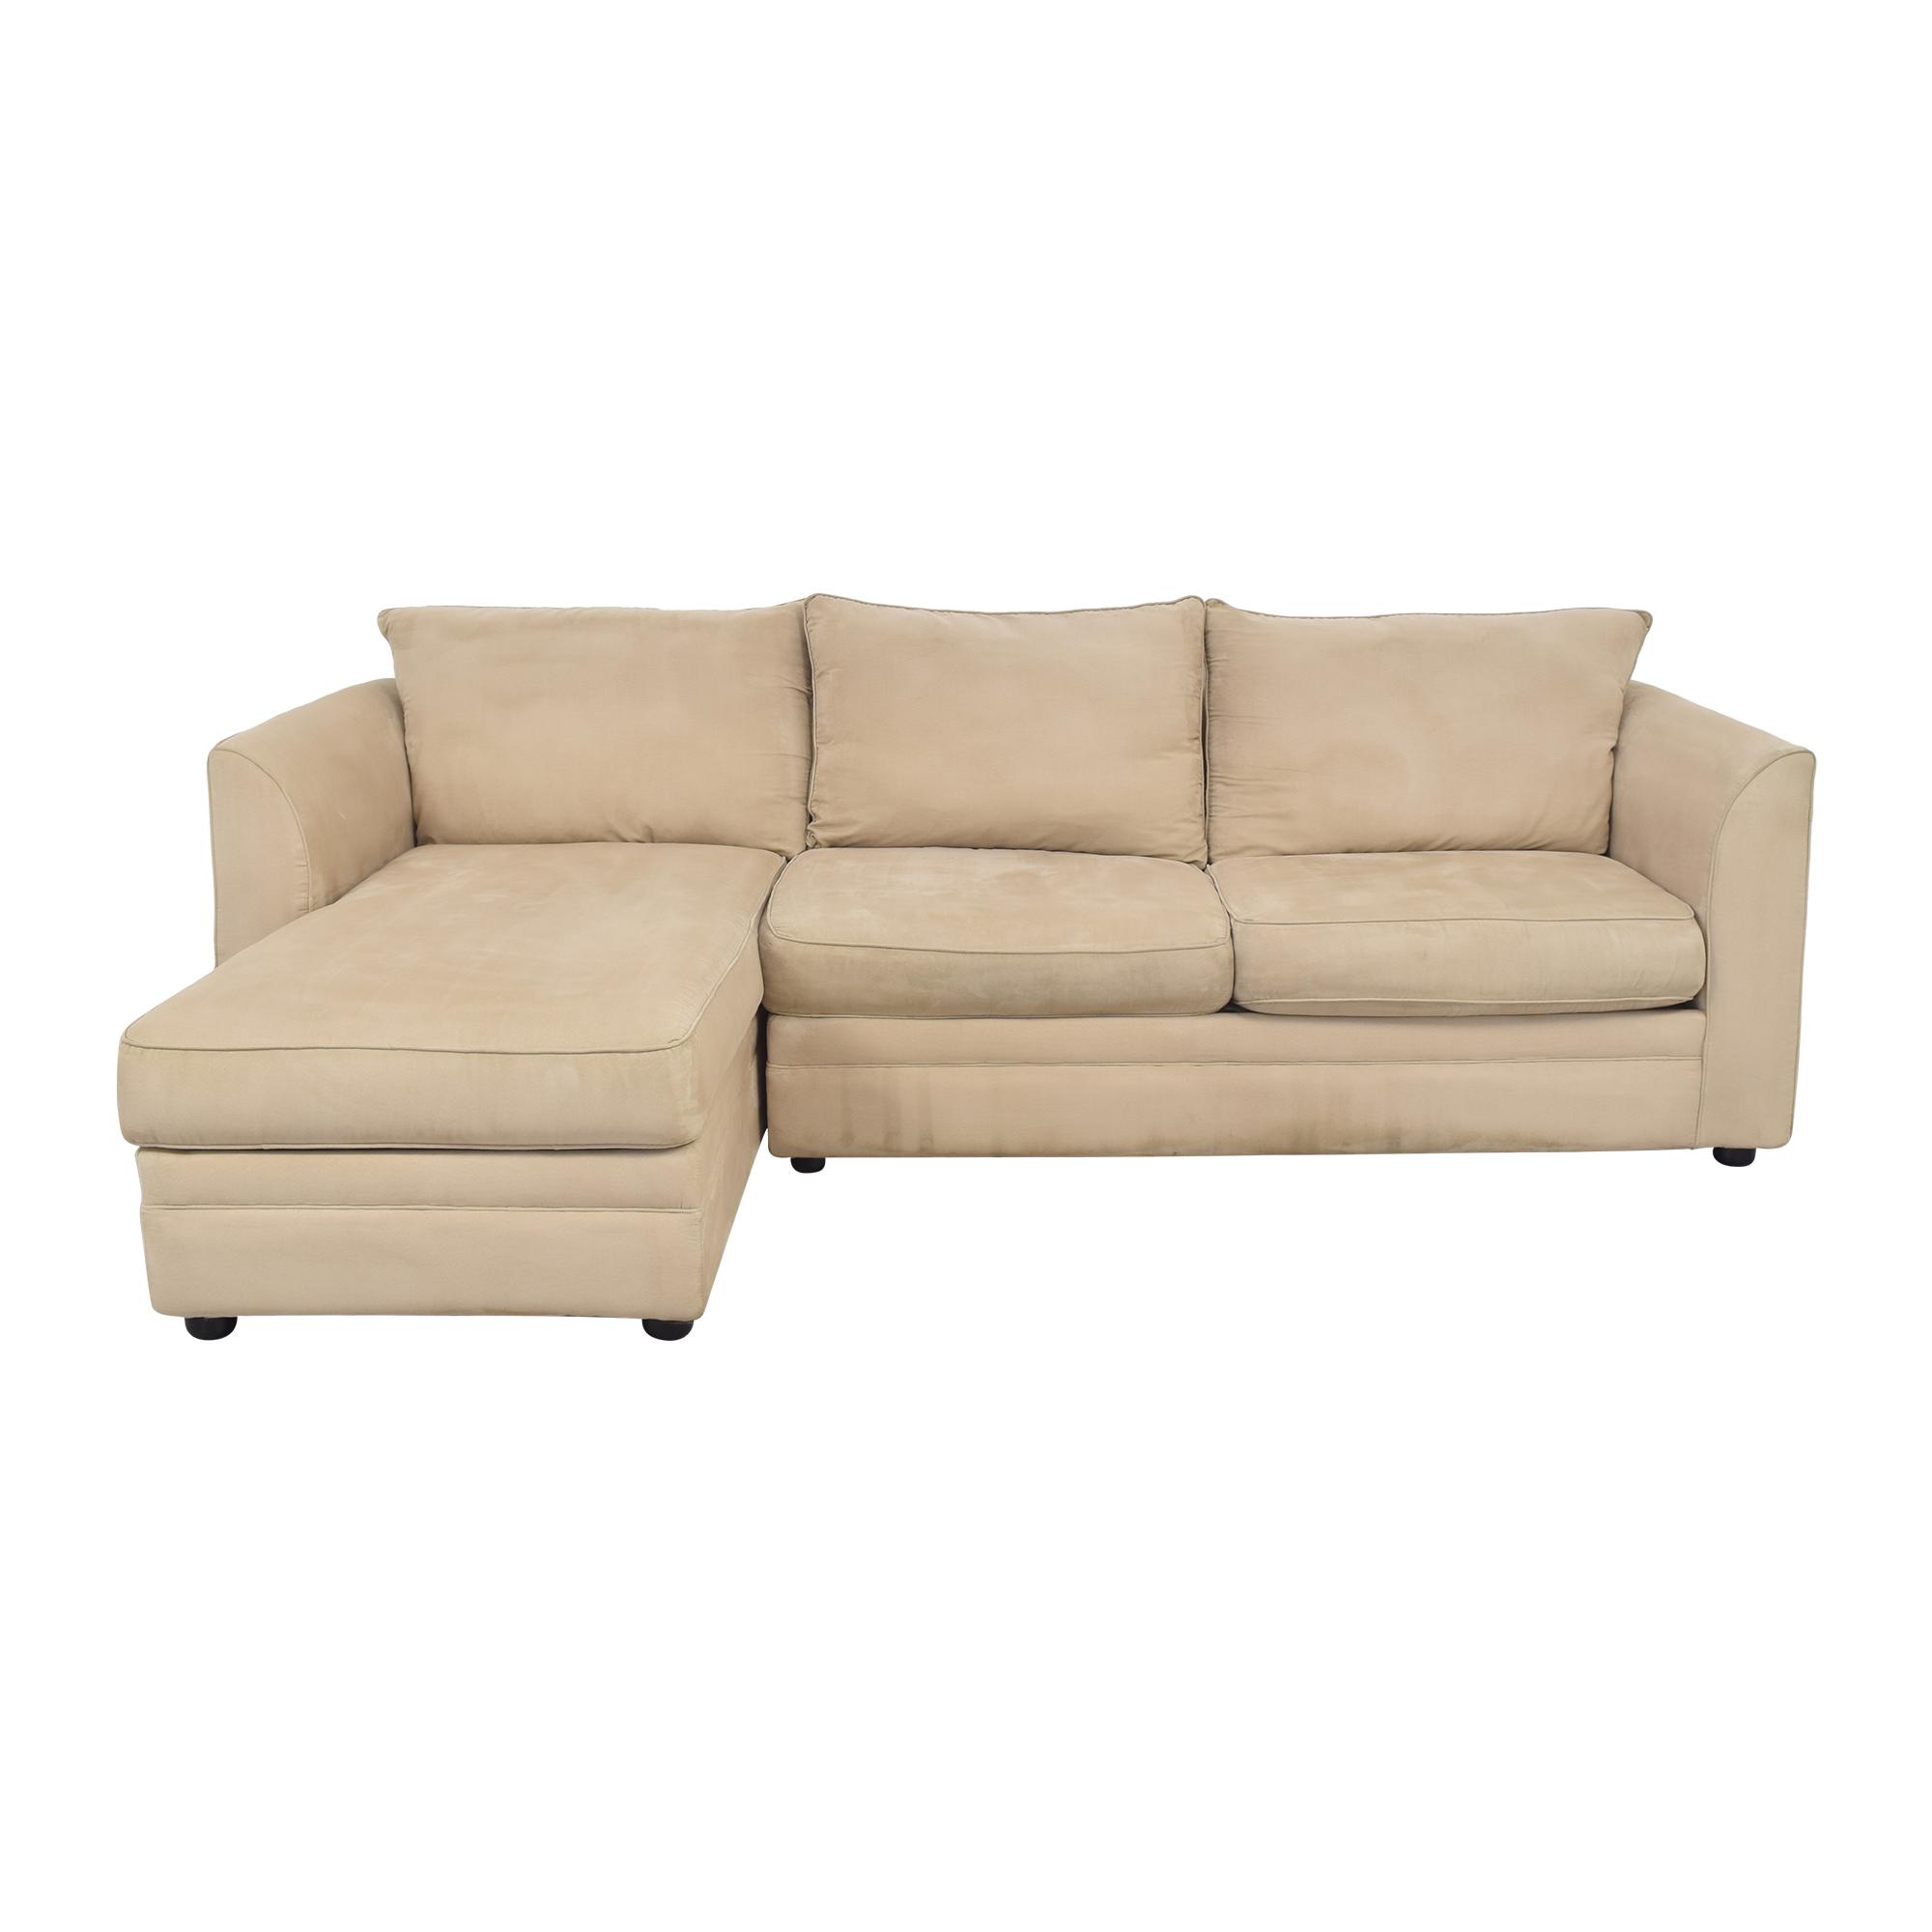 KFI KFI Chaise Sectional Sofa price